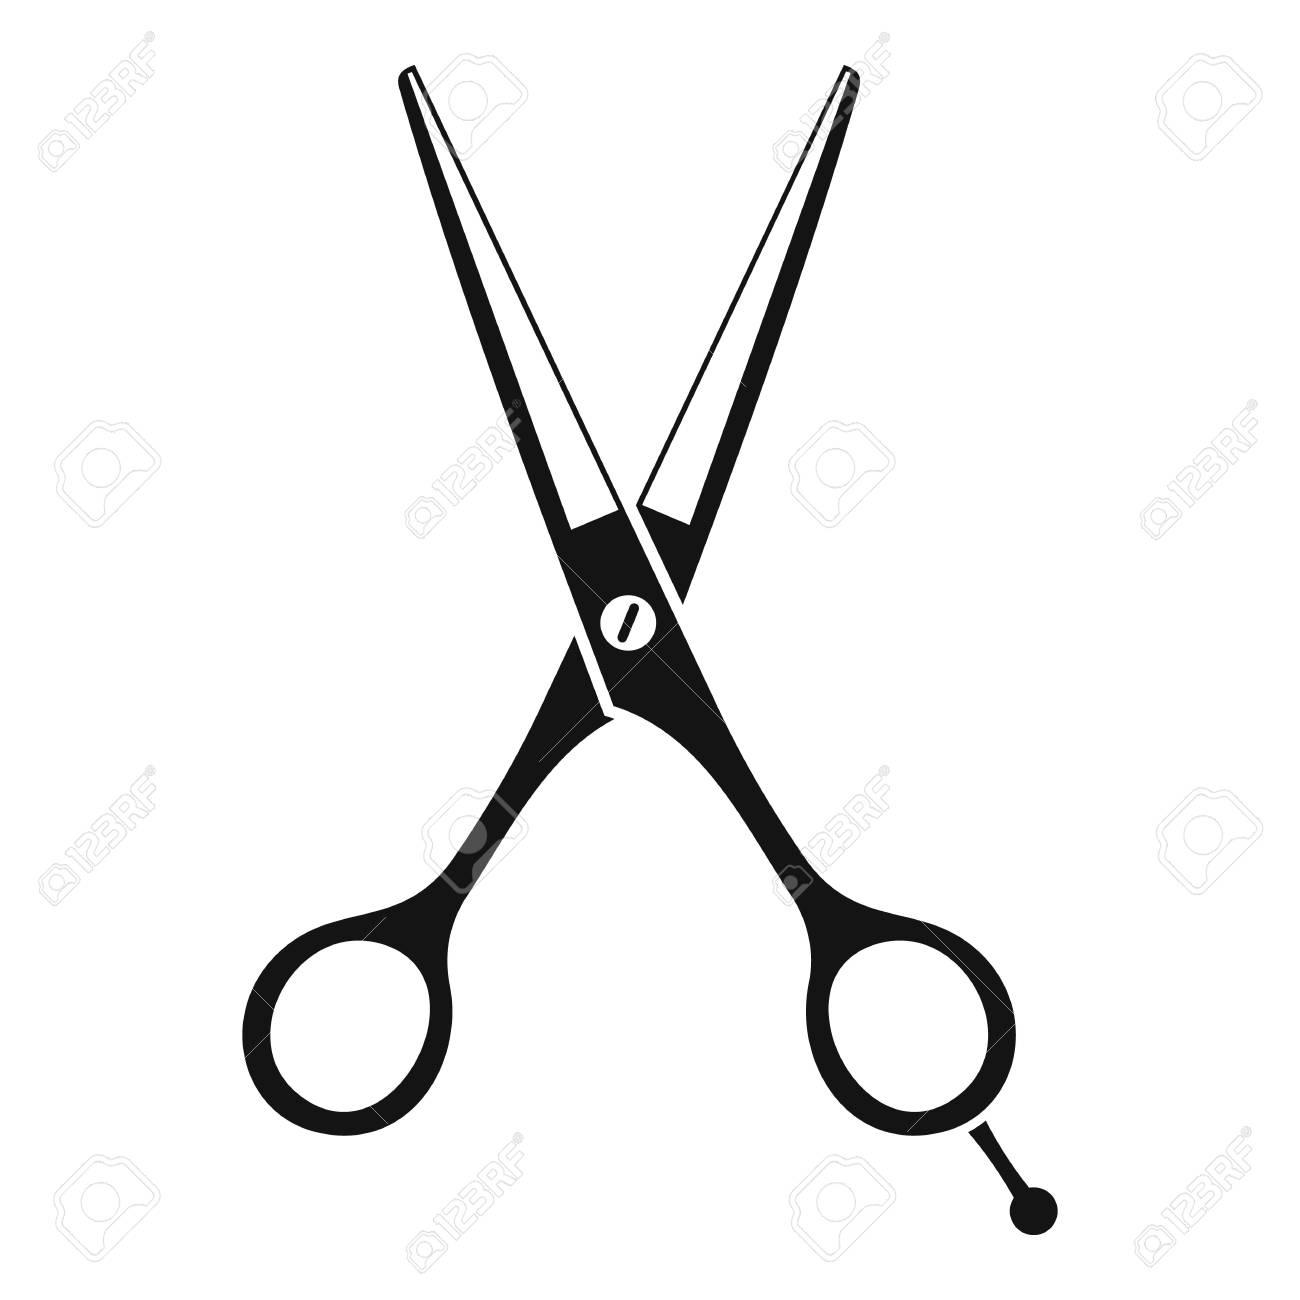 scissors icon simple illustration of scissors vector icon for rh 123rf com scissor vector image scissor vector image